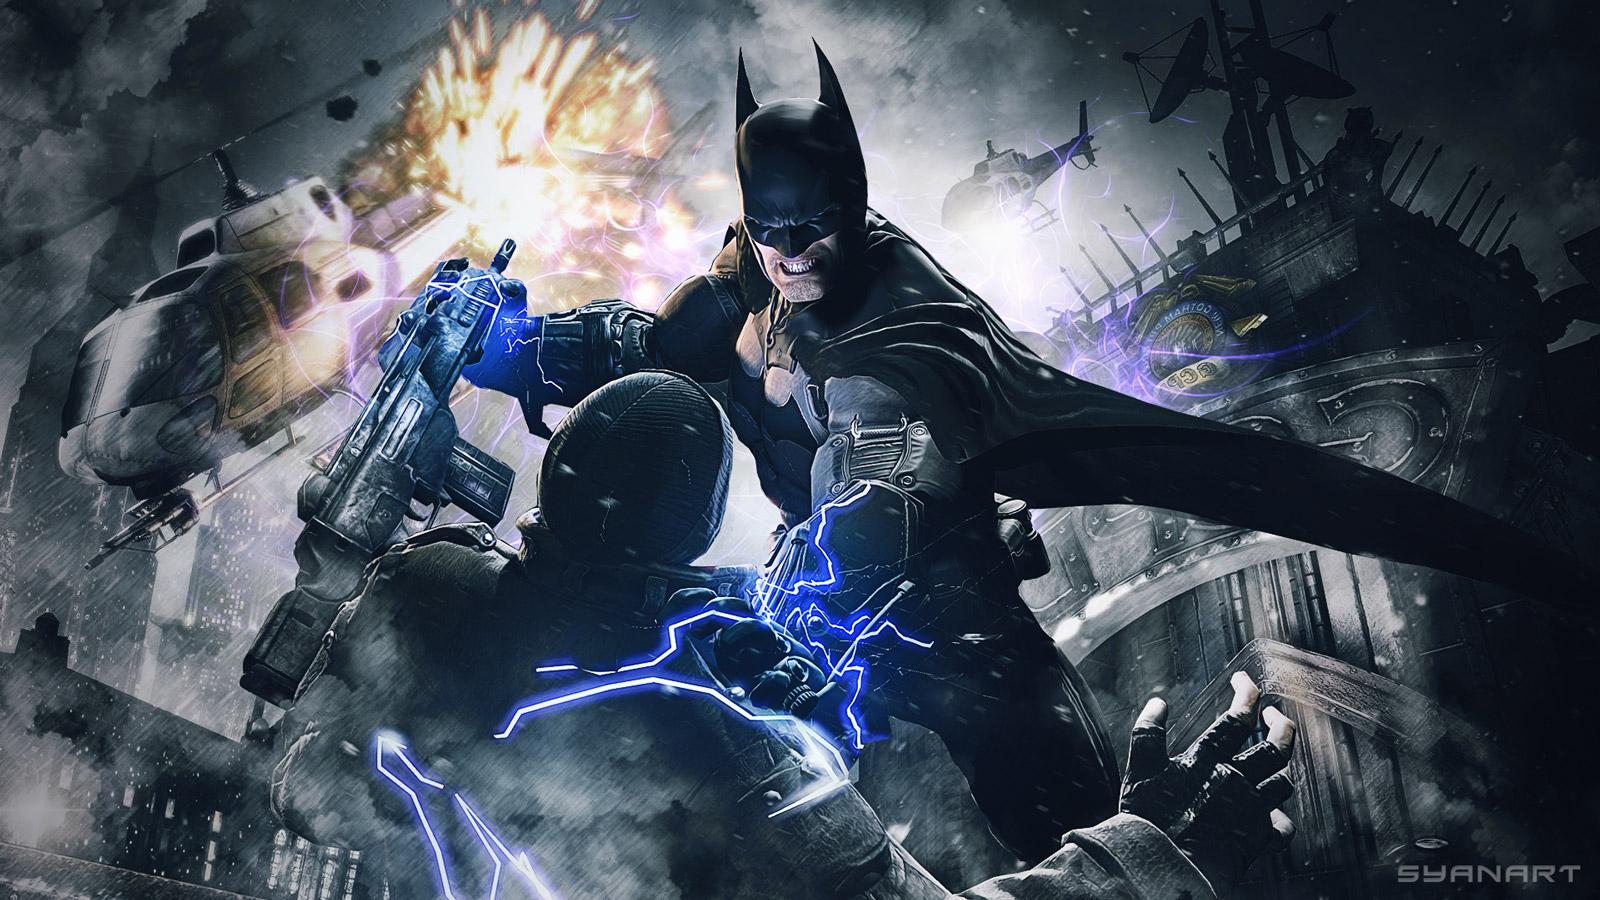 Batman: Arkham Origins Wallpaper in 1600x900